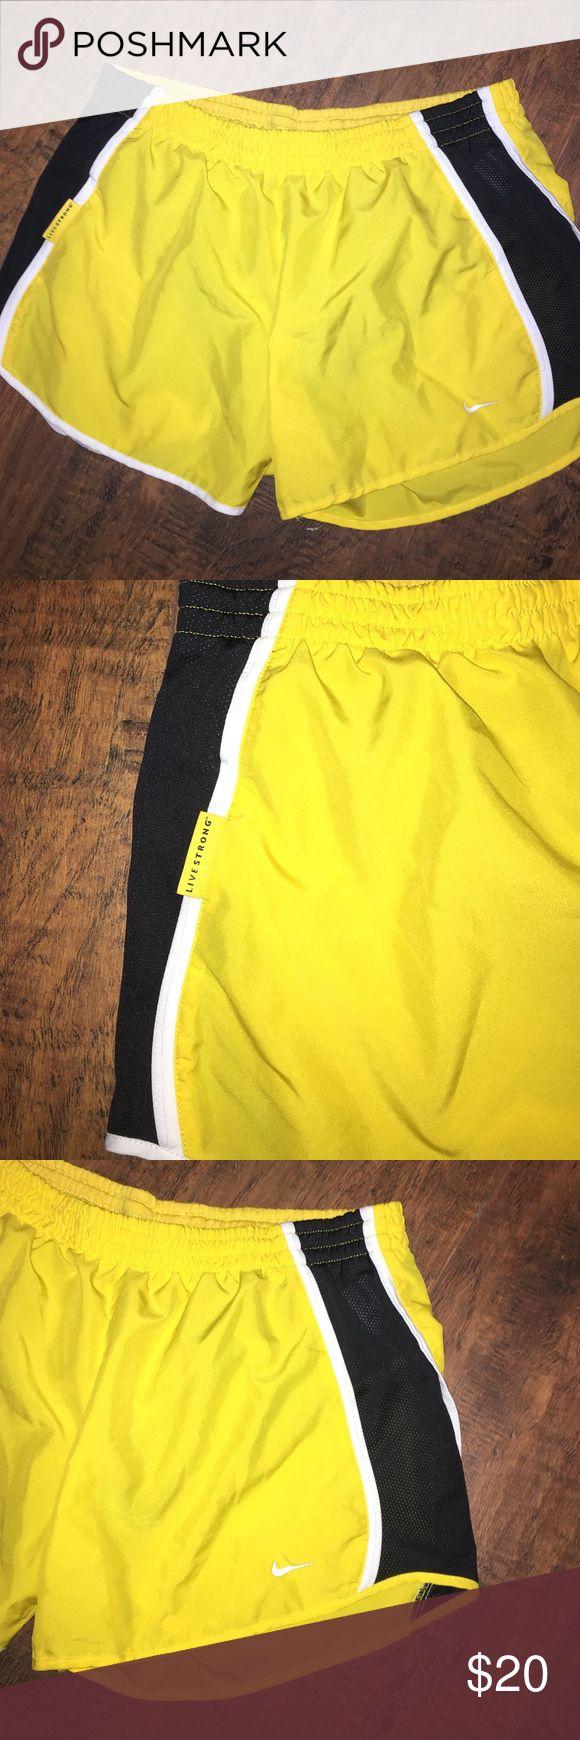 Women's Nike Shorts Barely worn live strong Nike shorts. Super cute. Nike Shorts